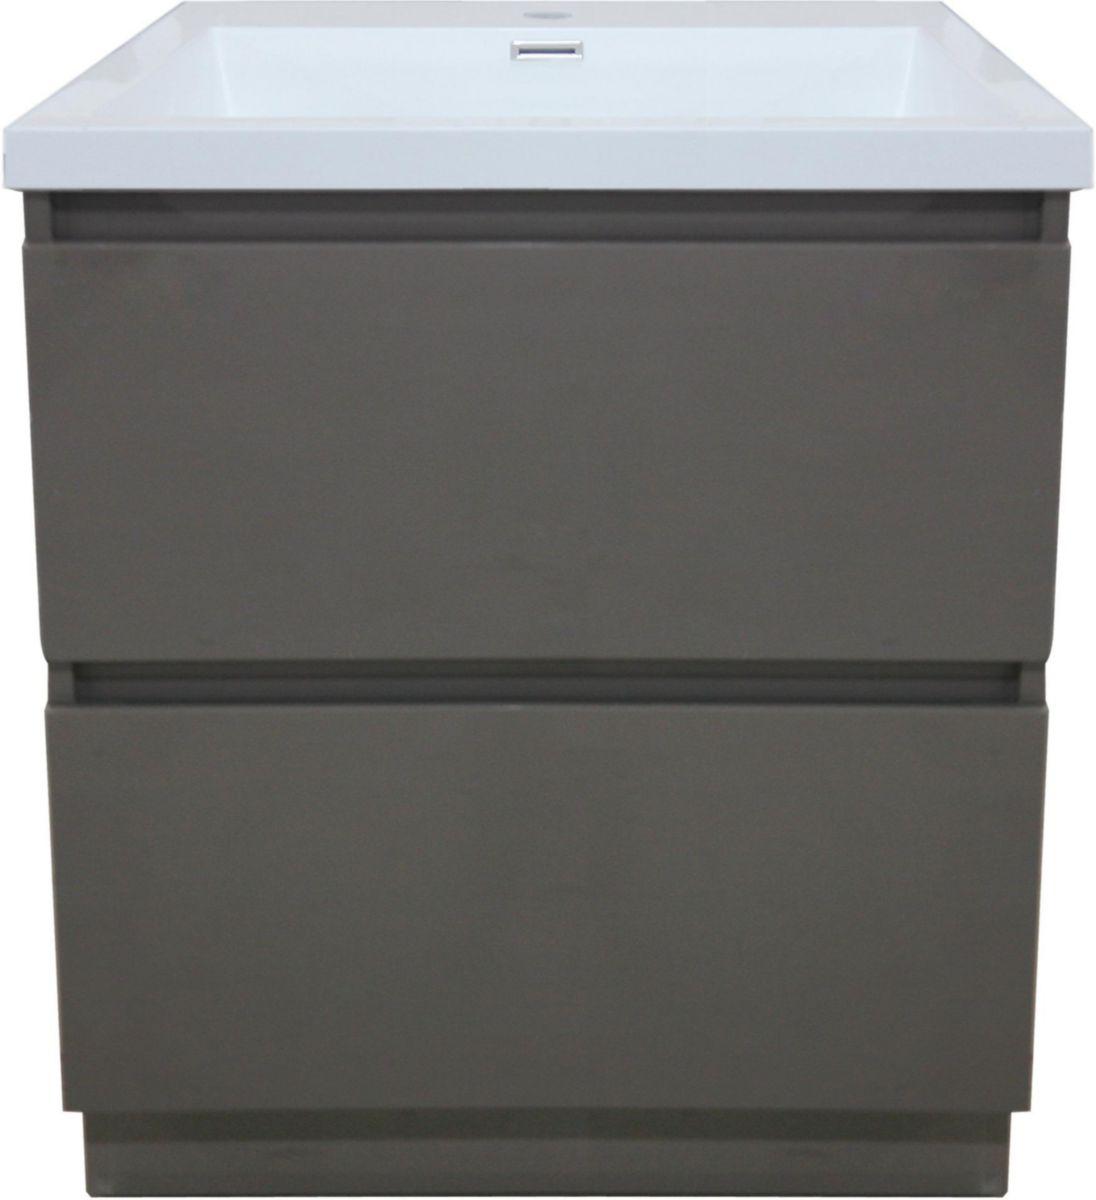 alterna meuble sous vasque primeo 80 cm au sol 2 tiroirs. Black Bedroom Furniture Sets. Home Design Ideas